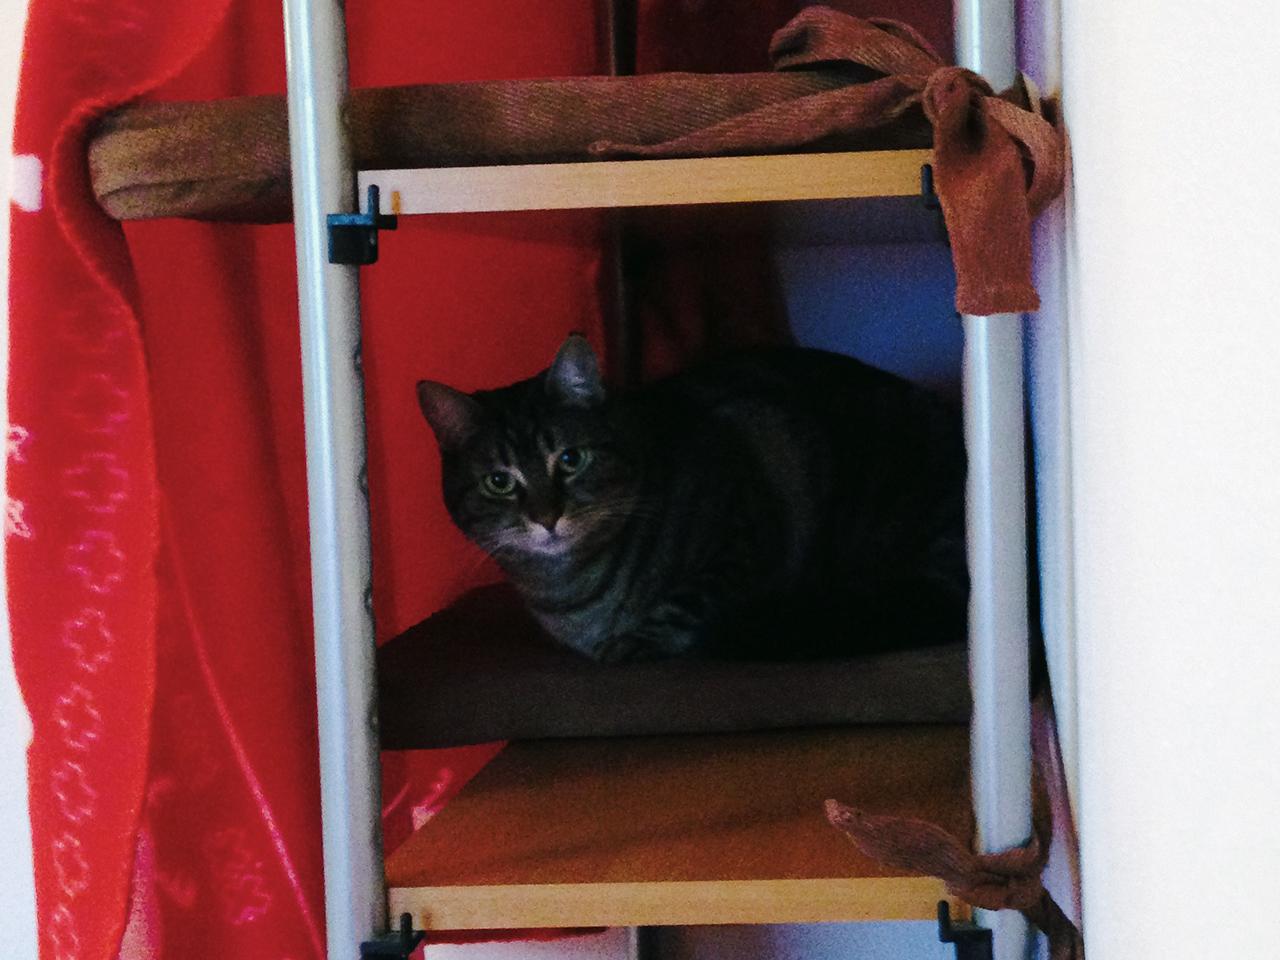 Maja testet das Regal-Versteck